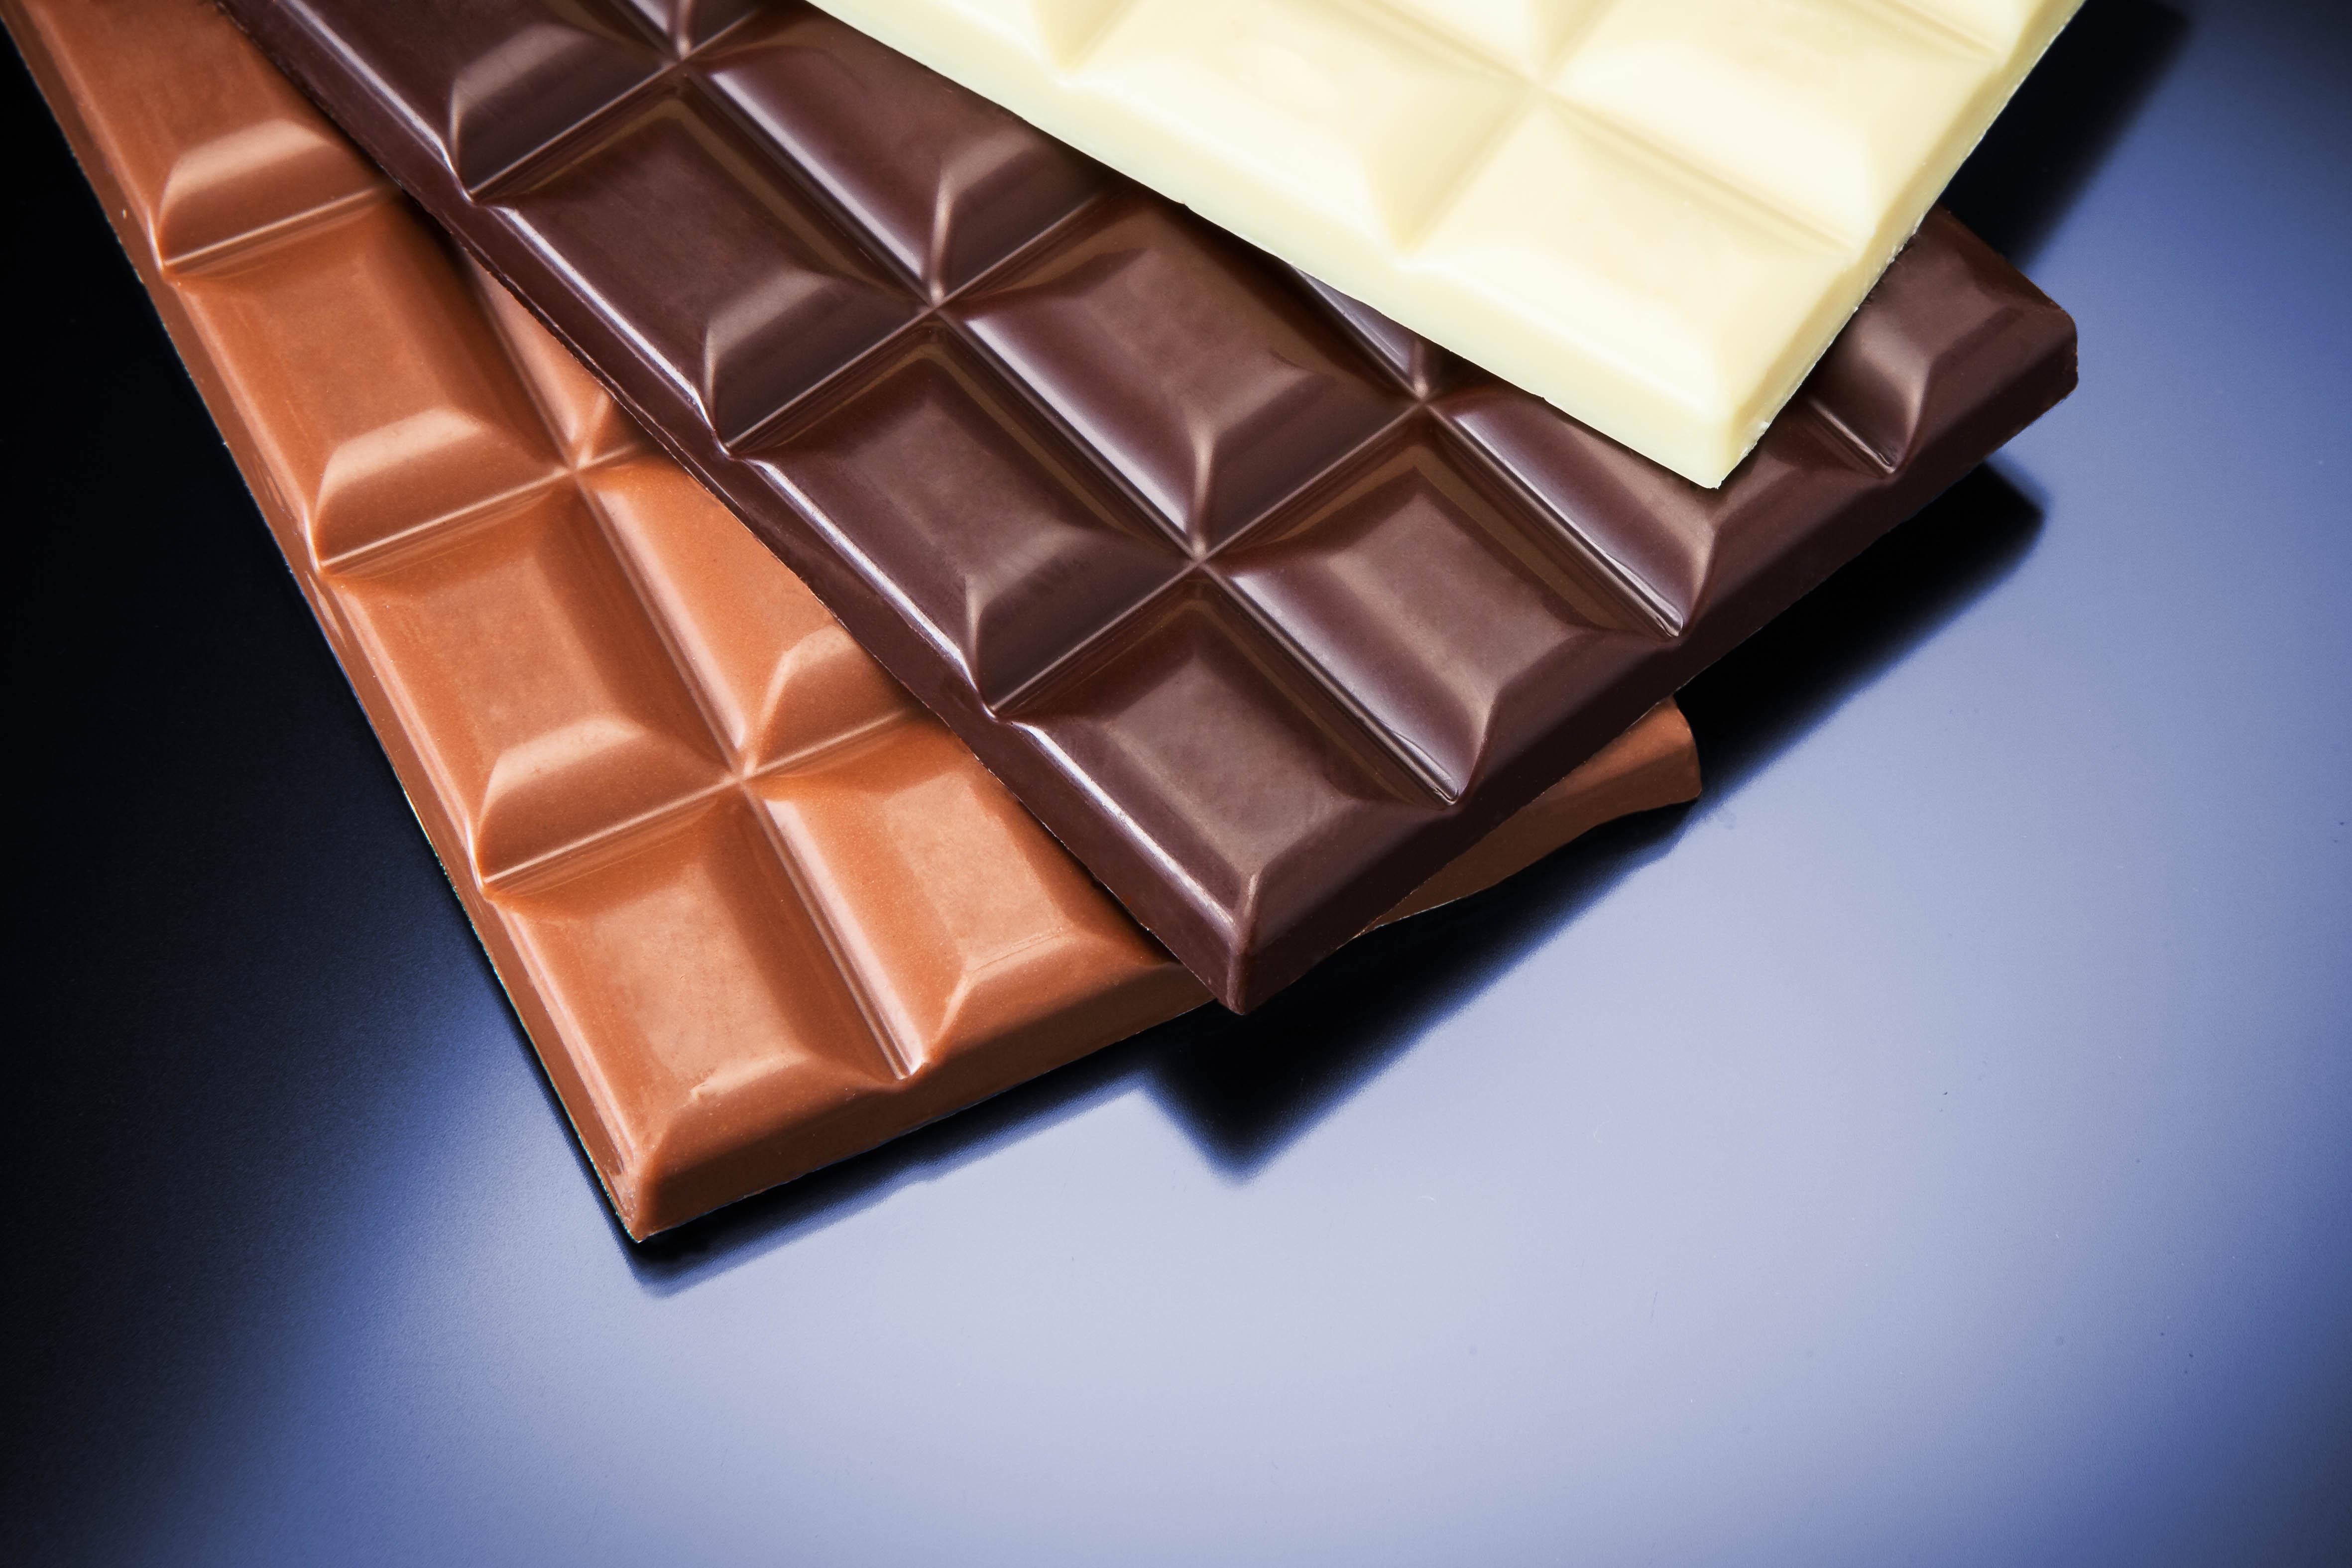 cocoa stability